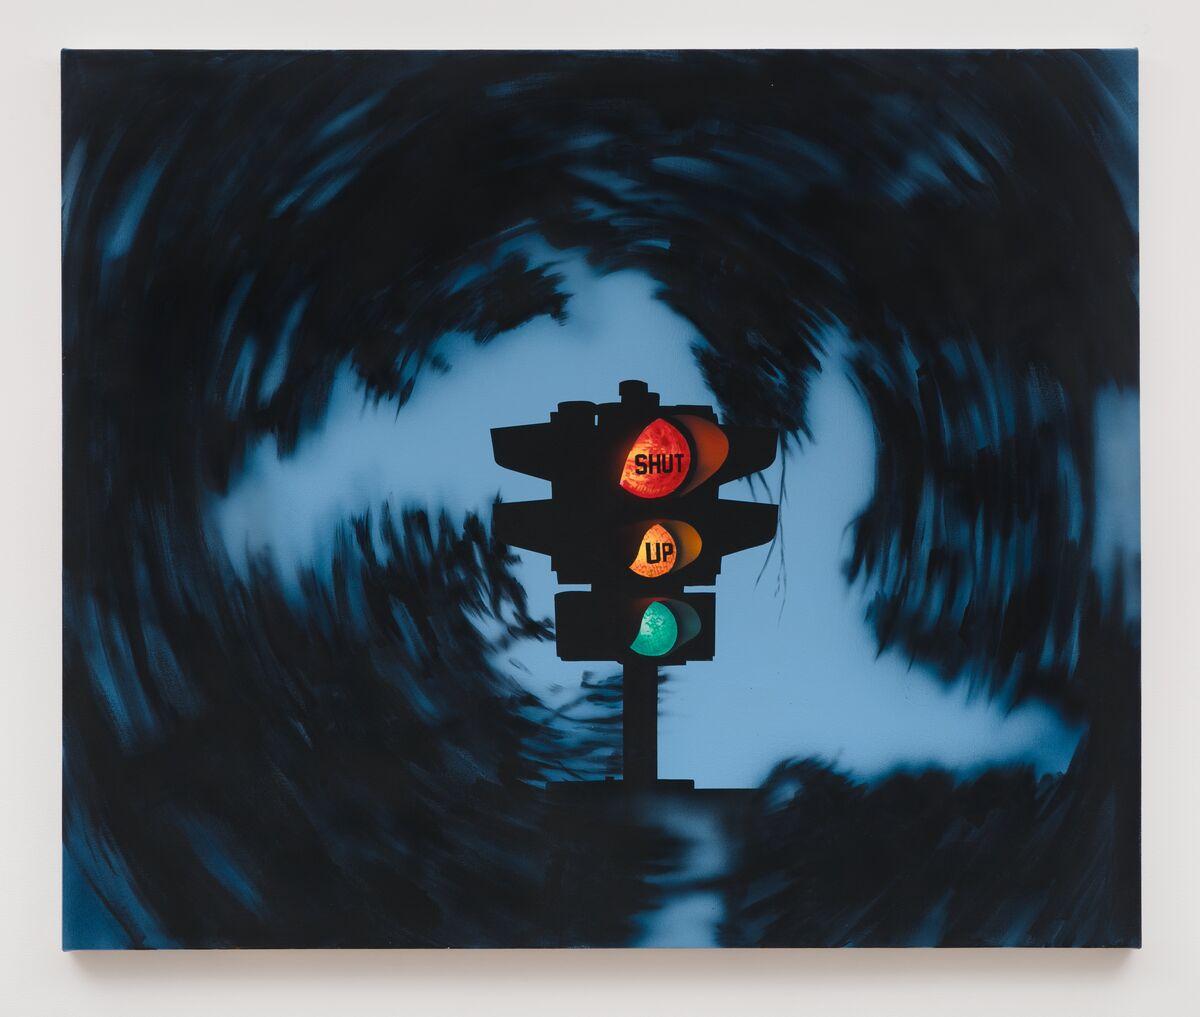 Jamian Juliano-Villain, Shut Up, the Painting, 2018. Photo by Charles Benton. Courtesy of the artist and JTT, New York.